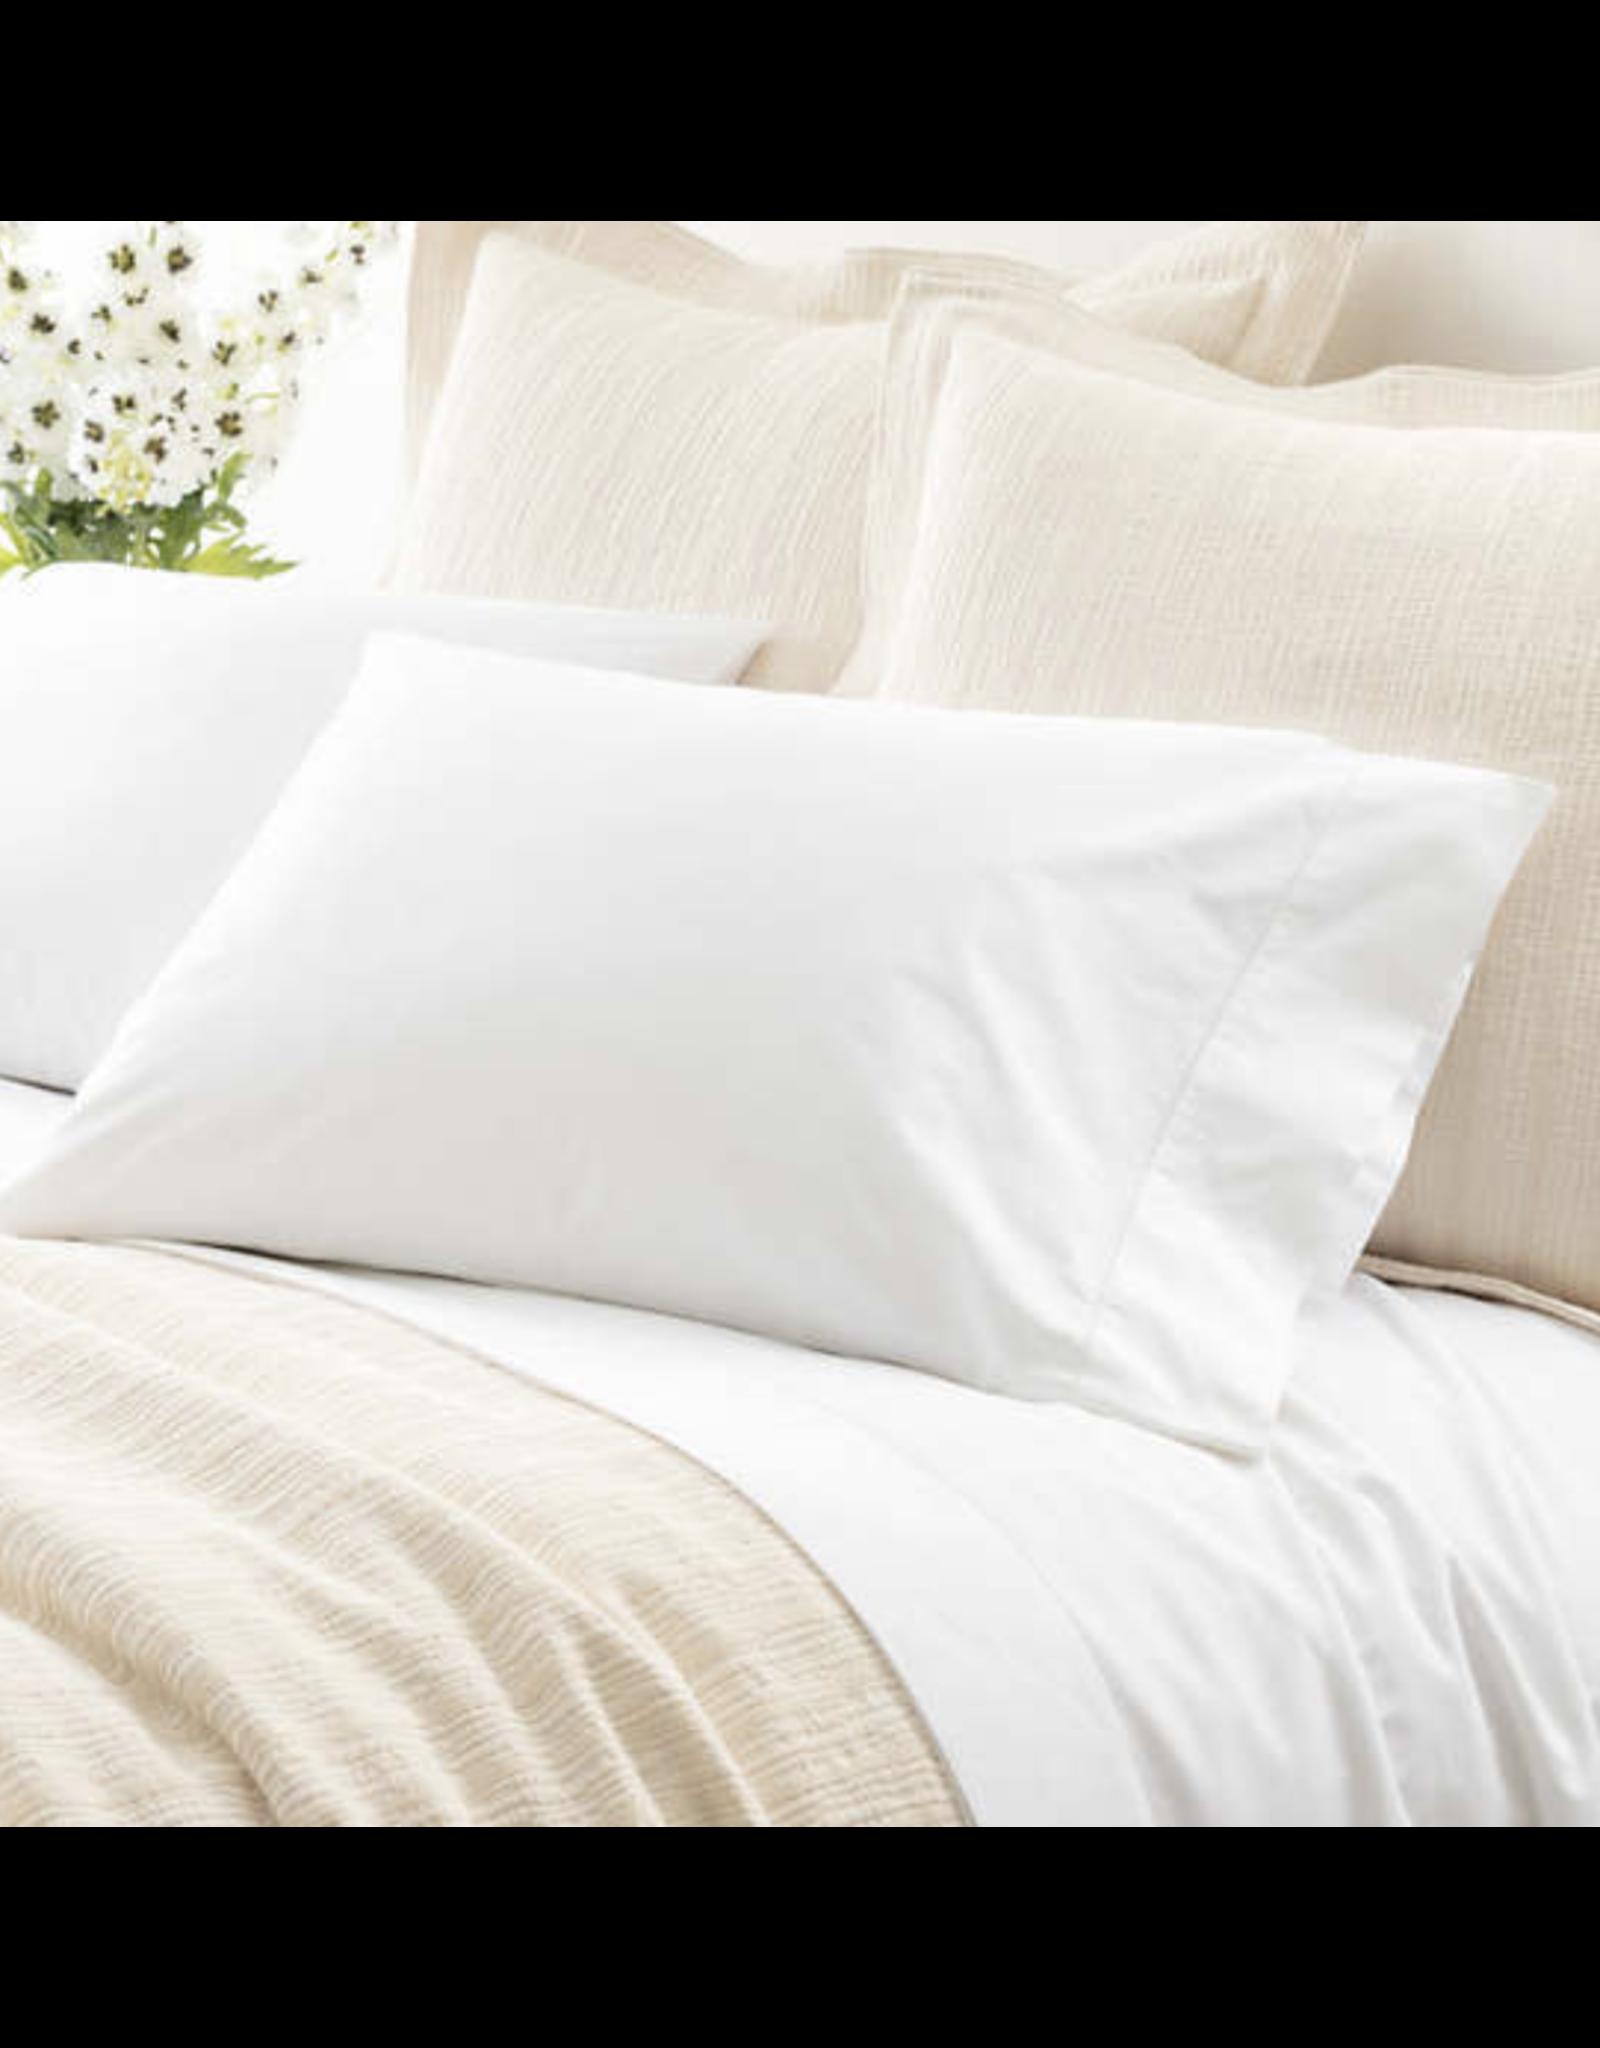 Pillowcases (pair) Classic Hemstitch